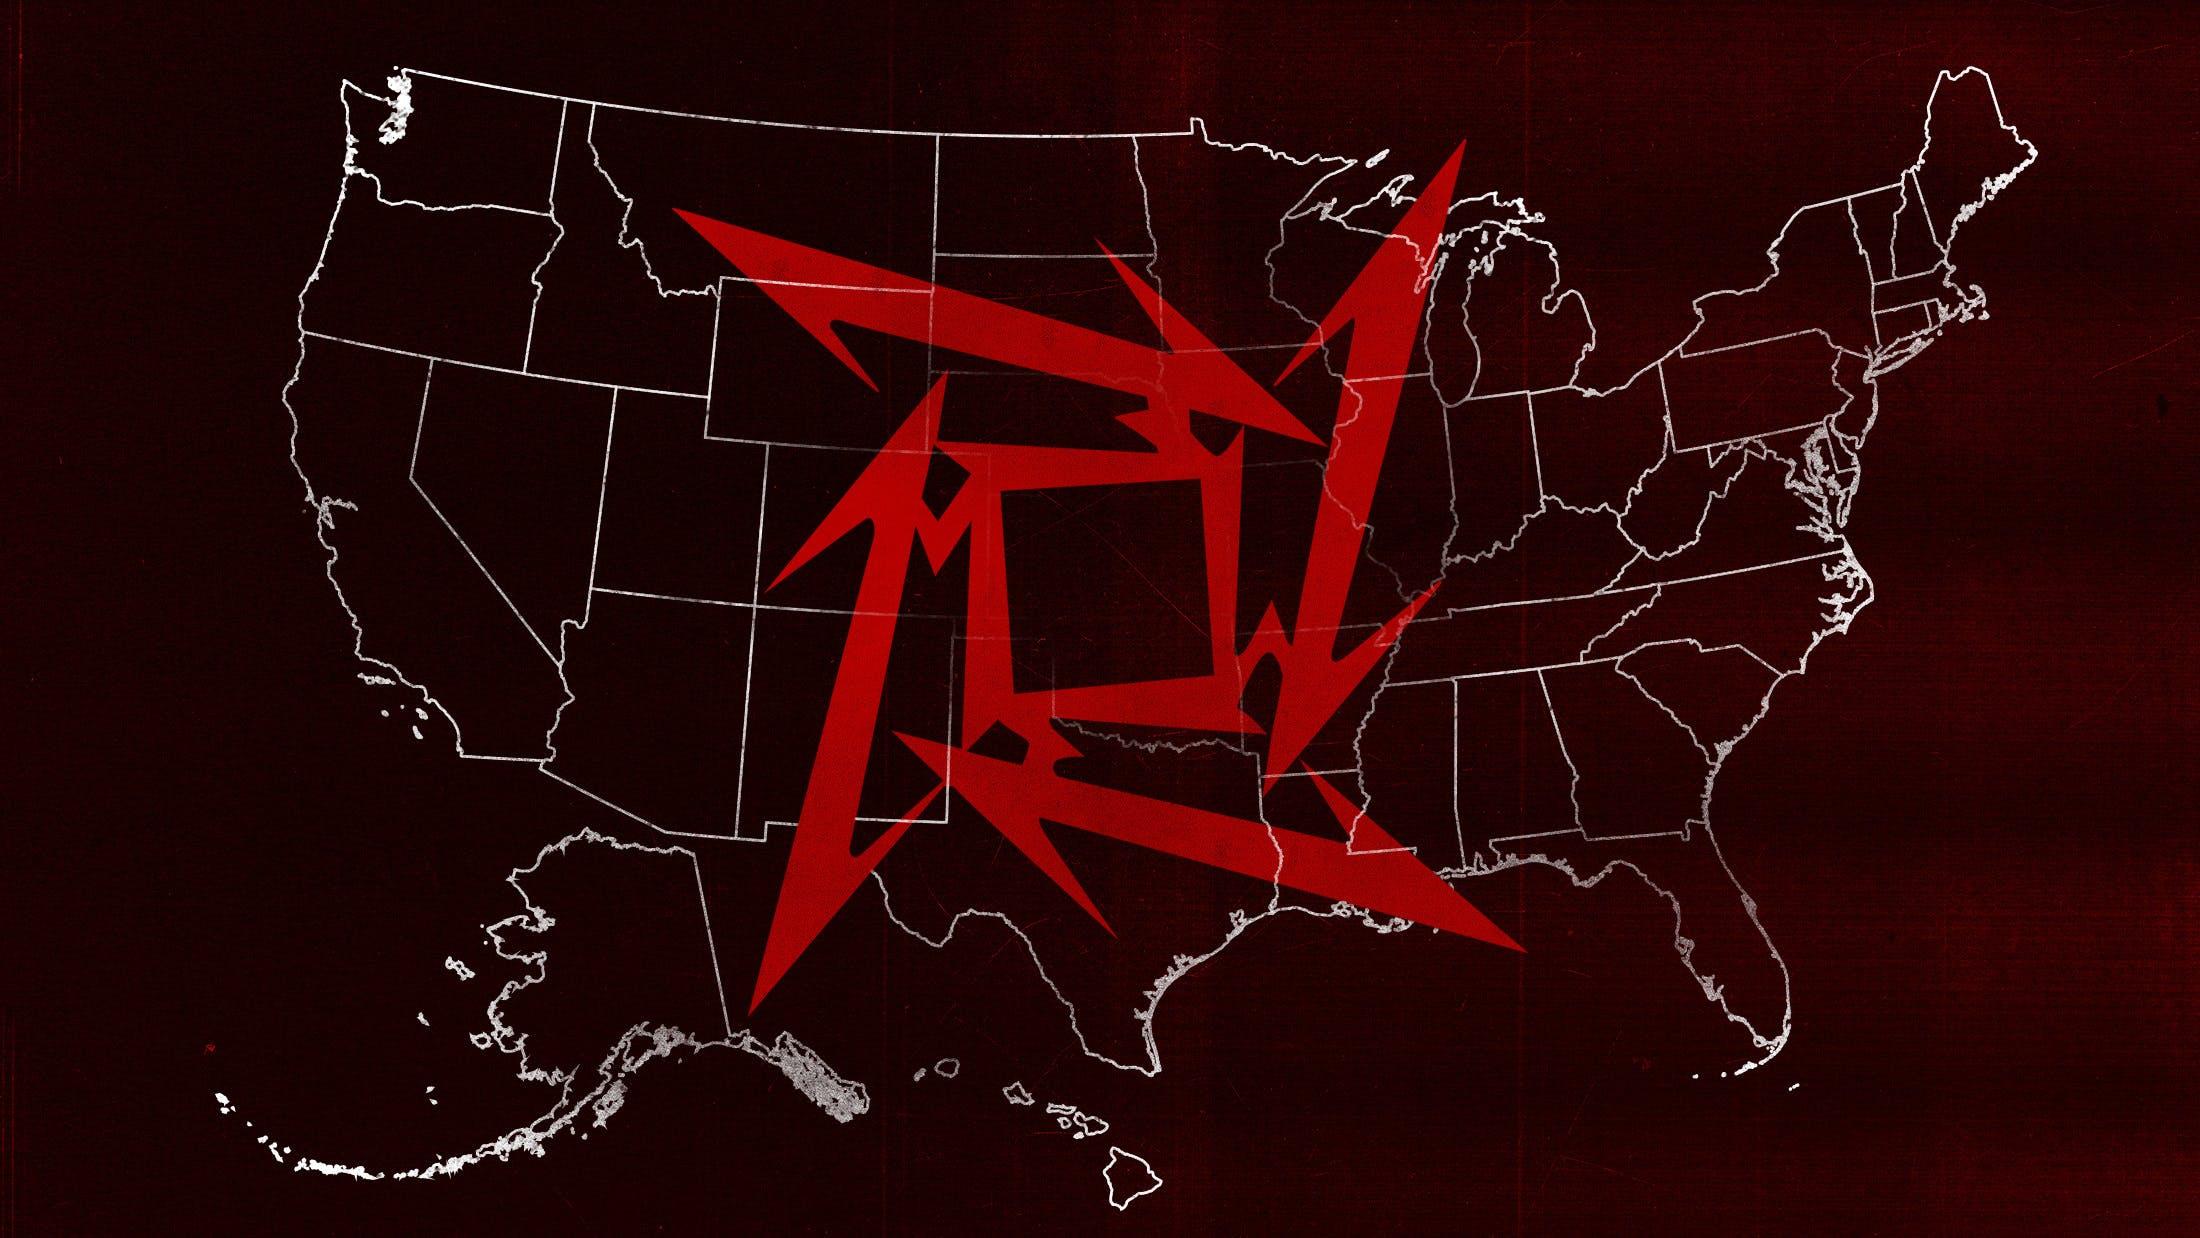 The United States Of Metallica